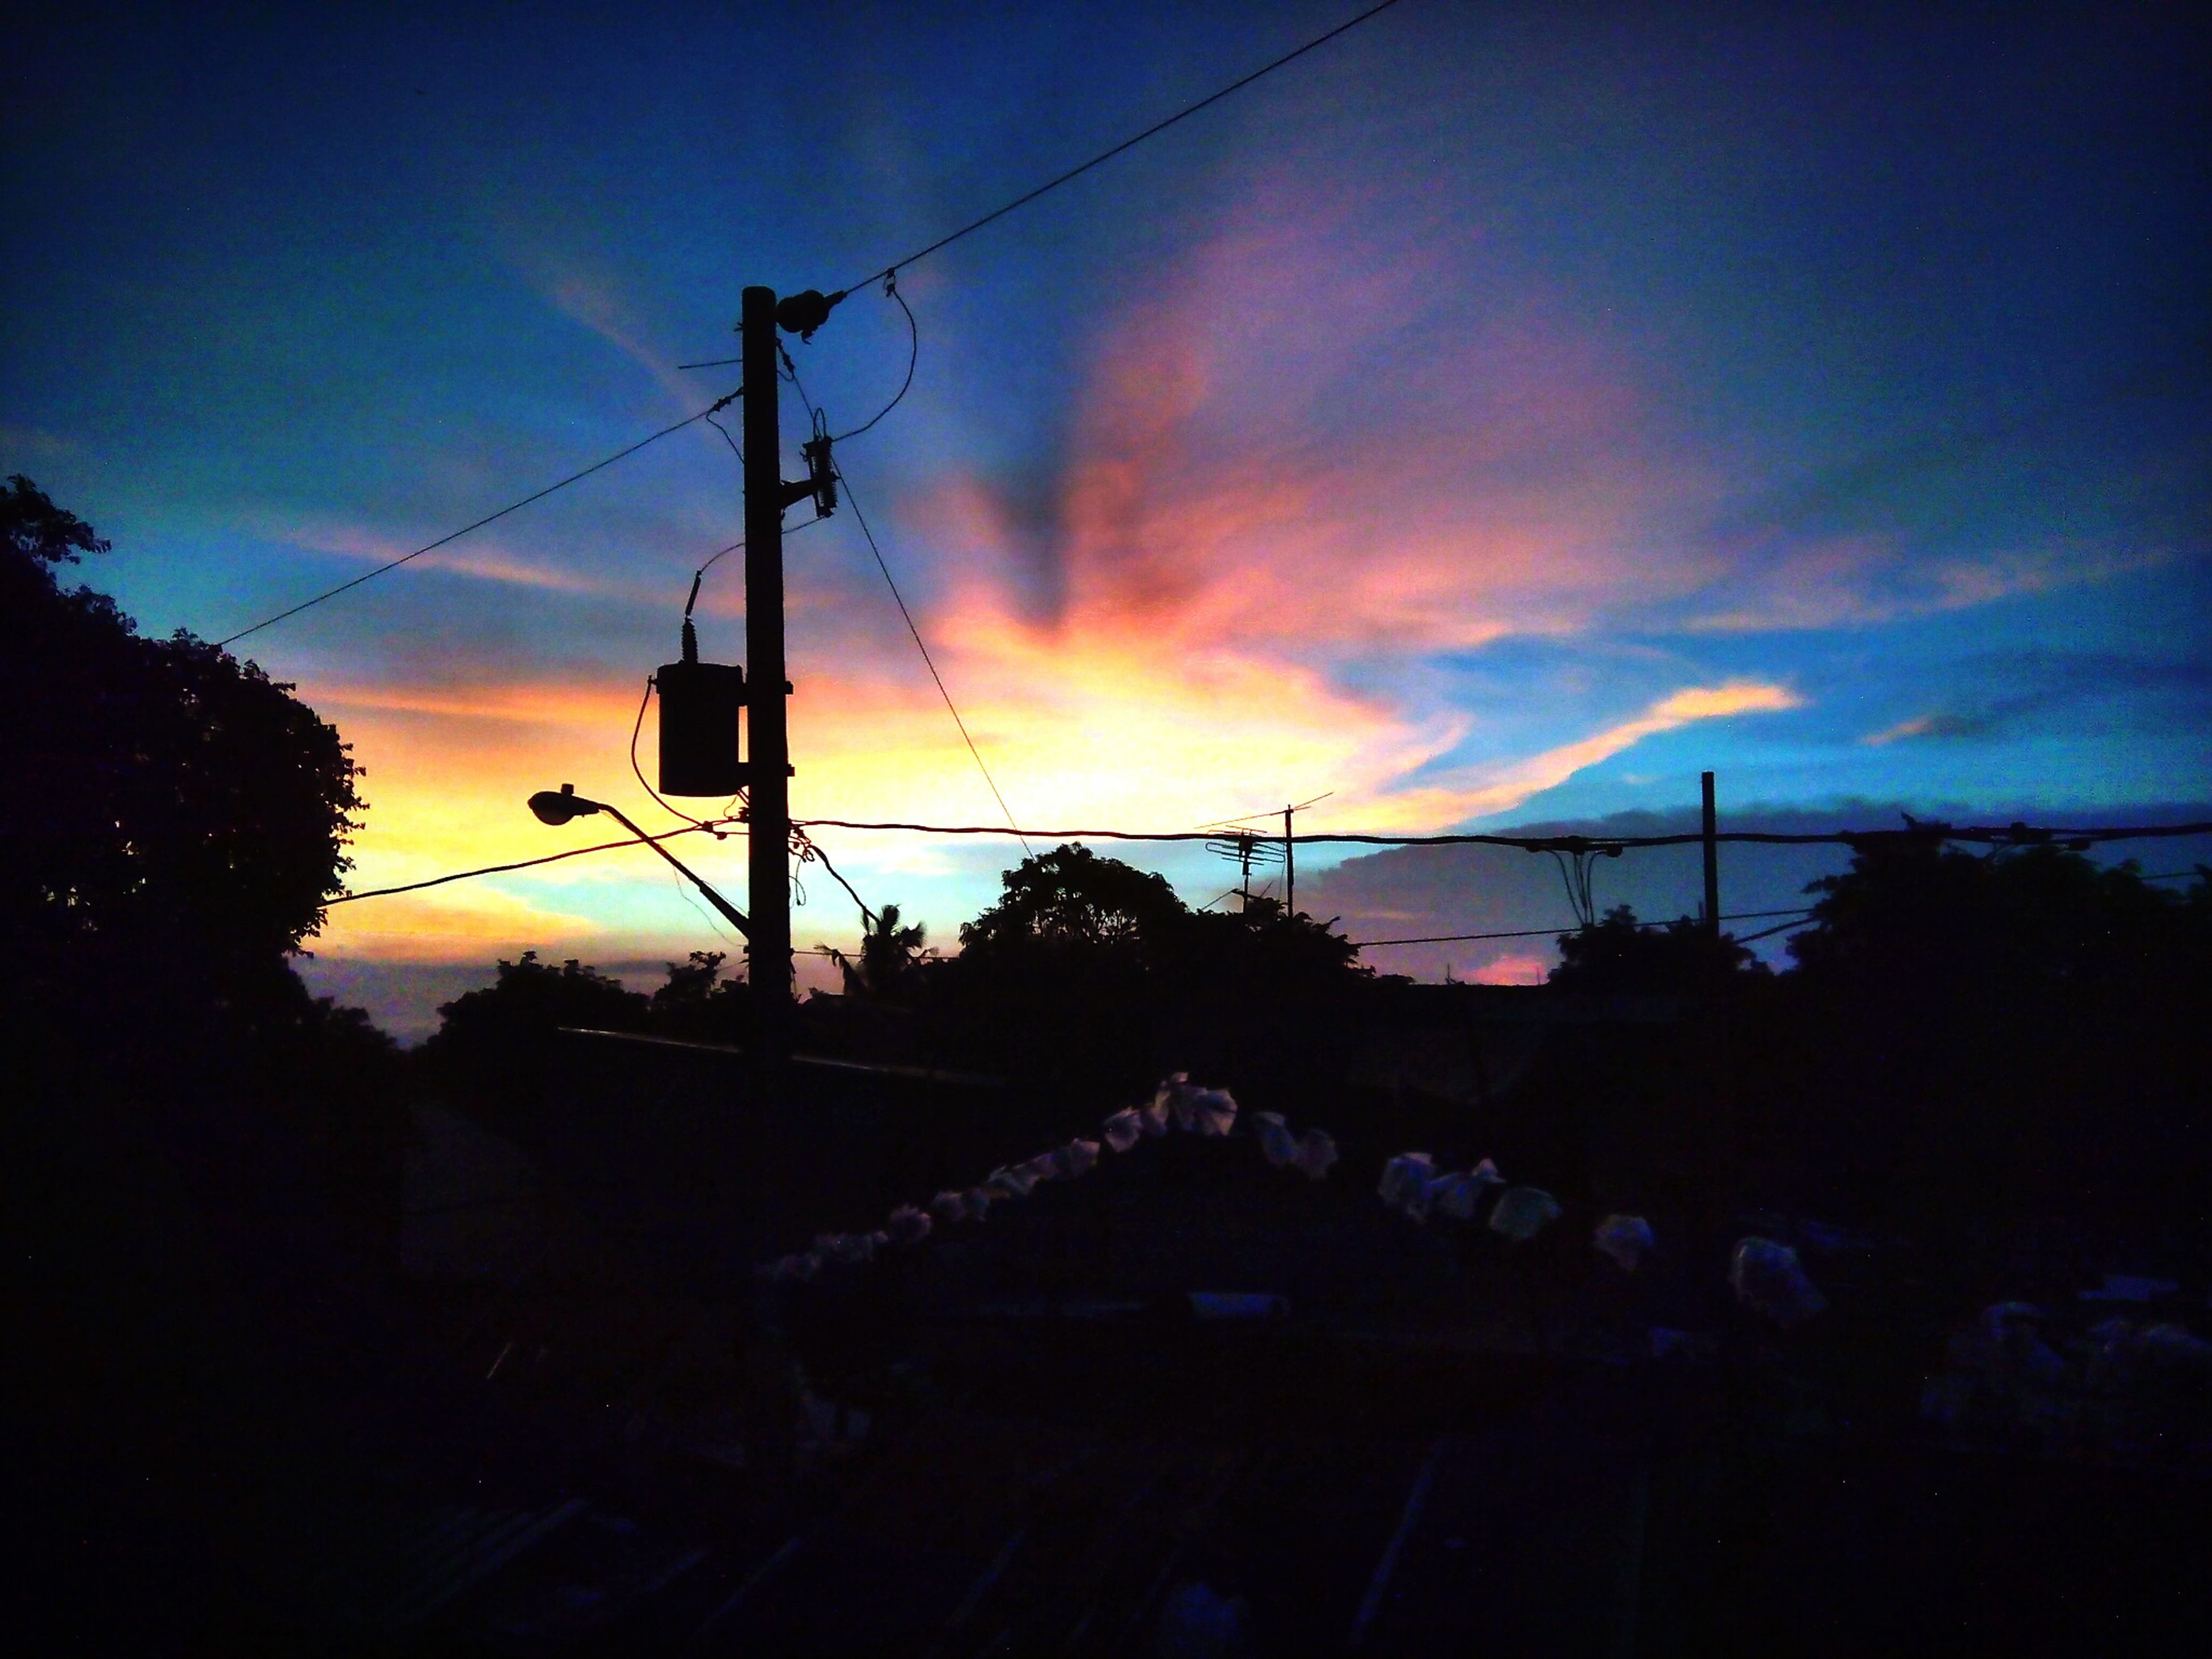 sunset, silhouette, sky, orange color, built structure, cloud - sky, electricity pylon, power line, architecture, building exterior, dramatic sky, dusk, beauty in nature, connection, electricity, scenics, nature, cloud, power supply, tree